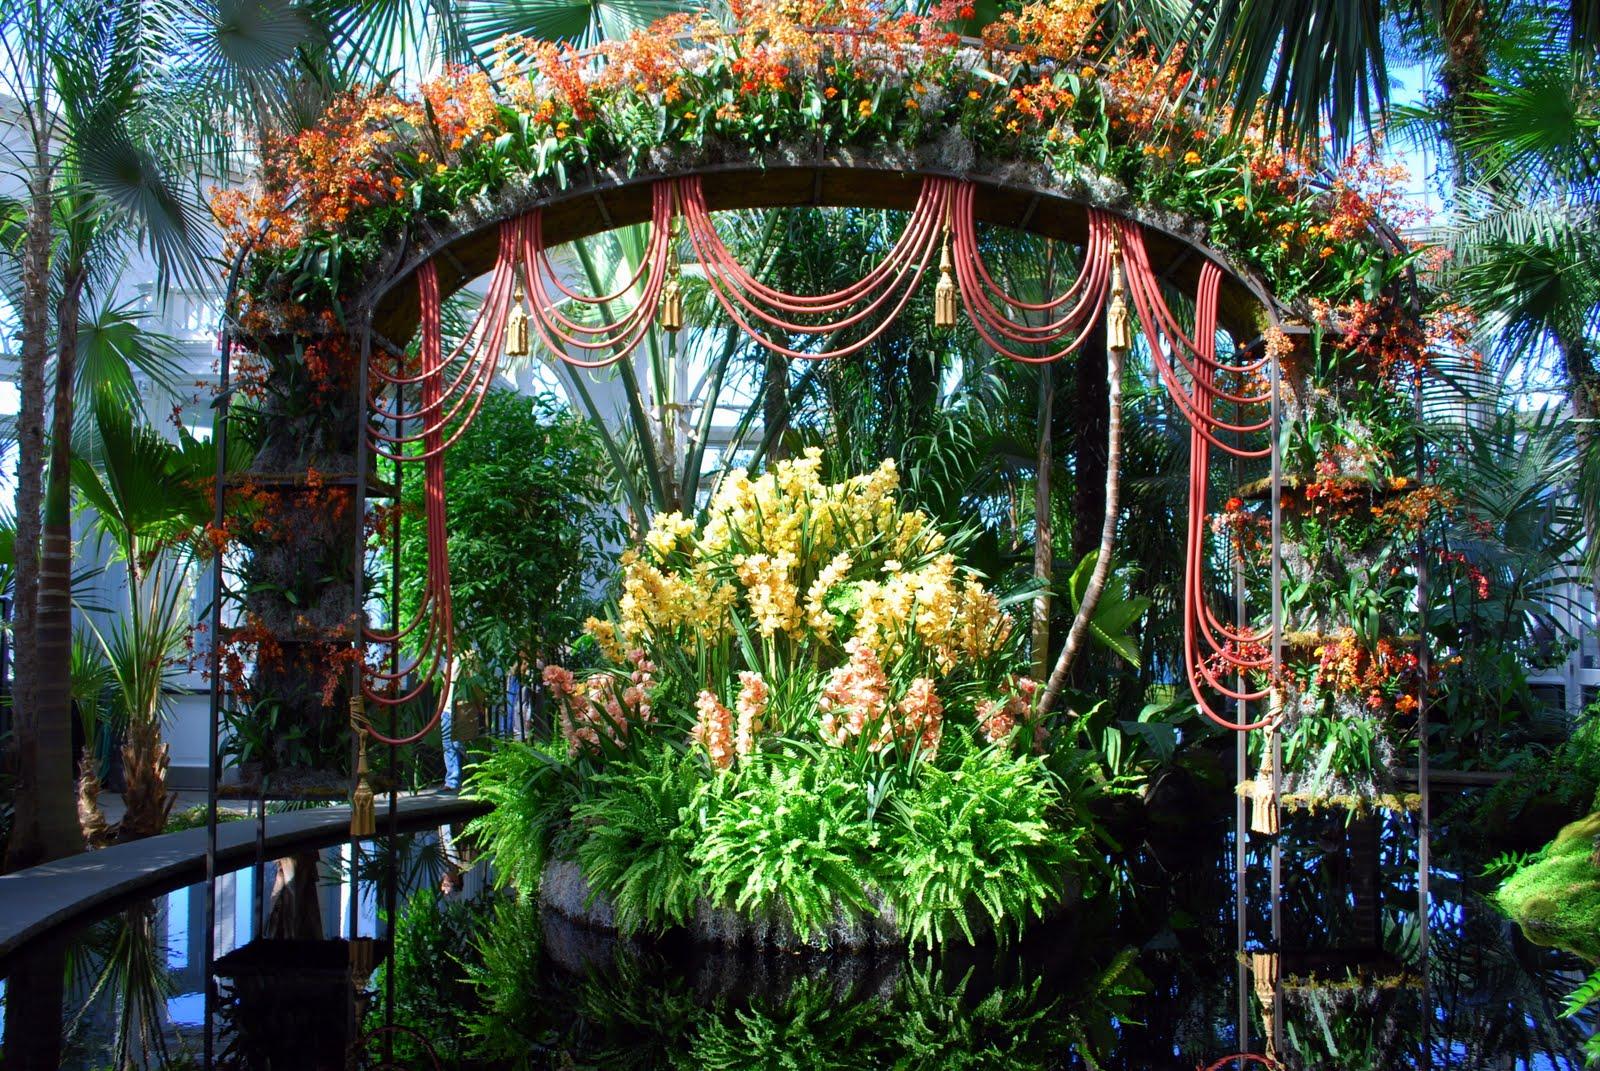 Mille Fiori Favoriti The New York Botanical Garden Orchid